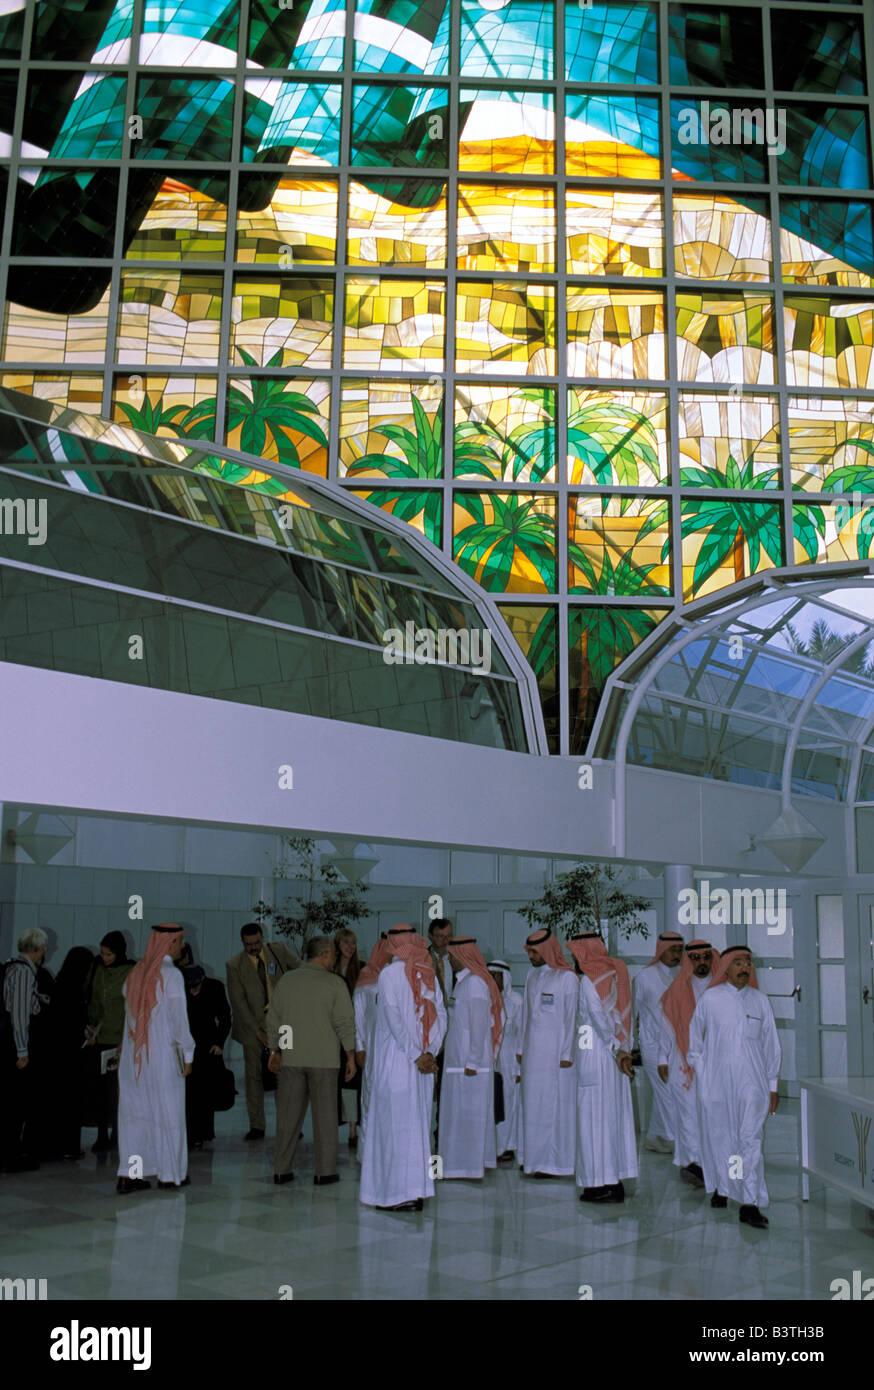 Asia, Arabia Saudí, Riad. Dentro de Rey Fahid Centro Cultural. Imagen De Stock